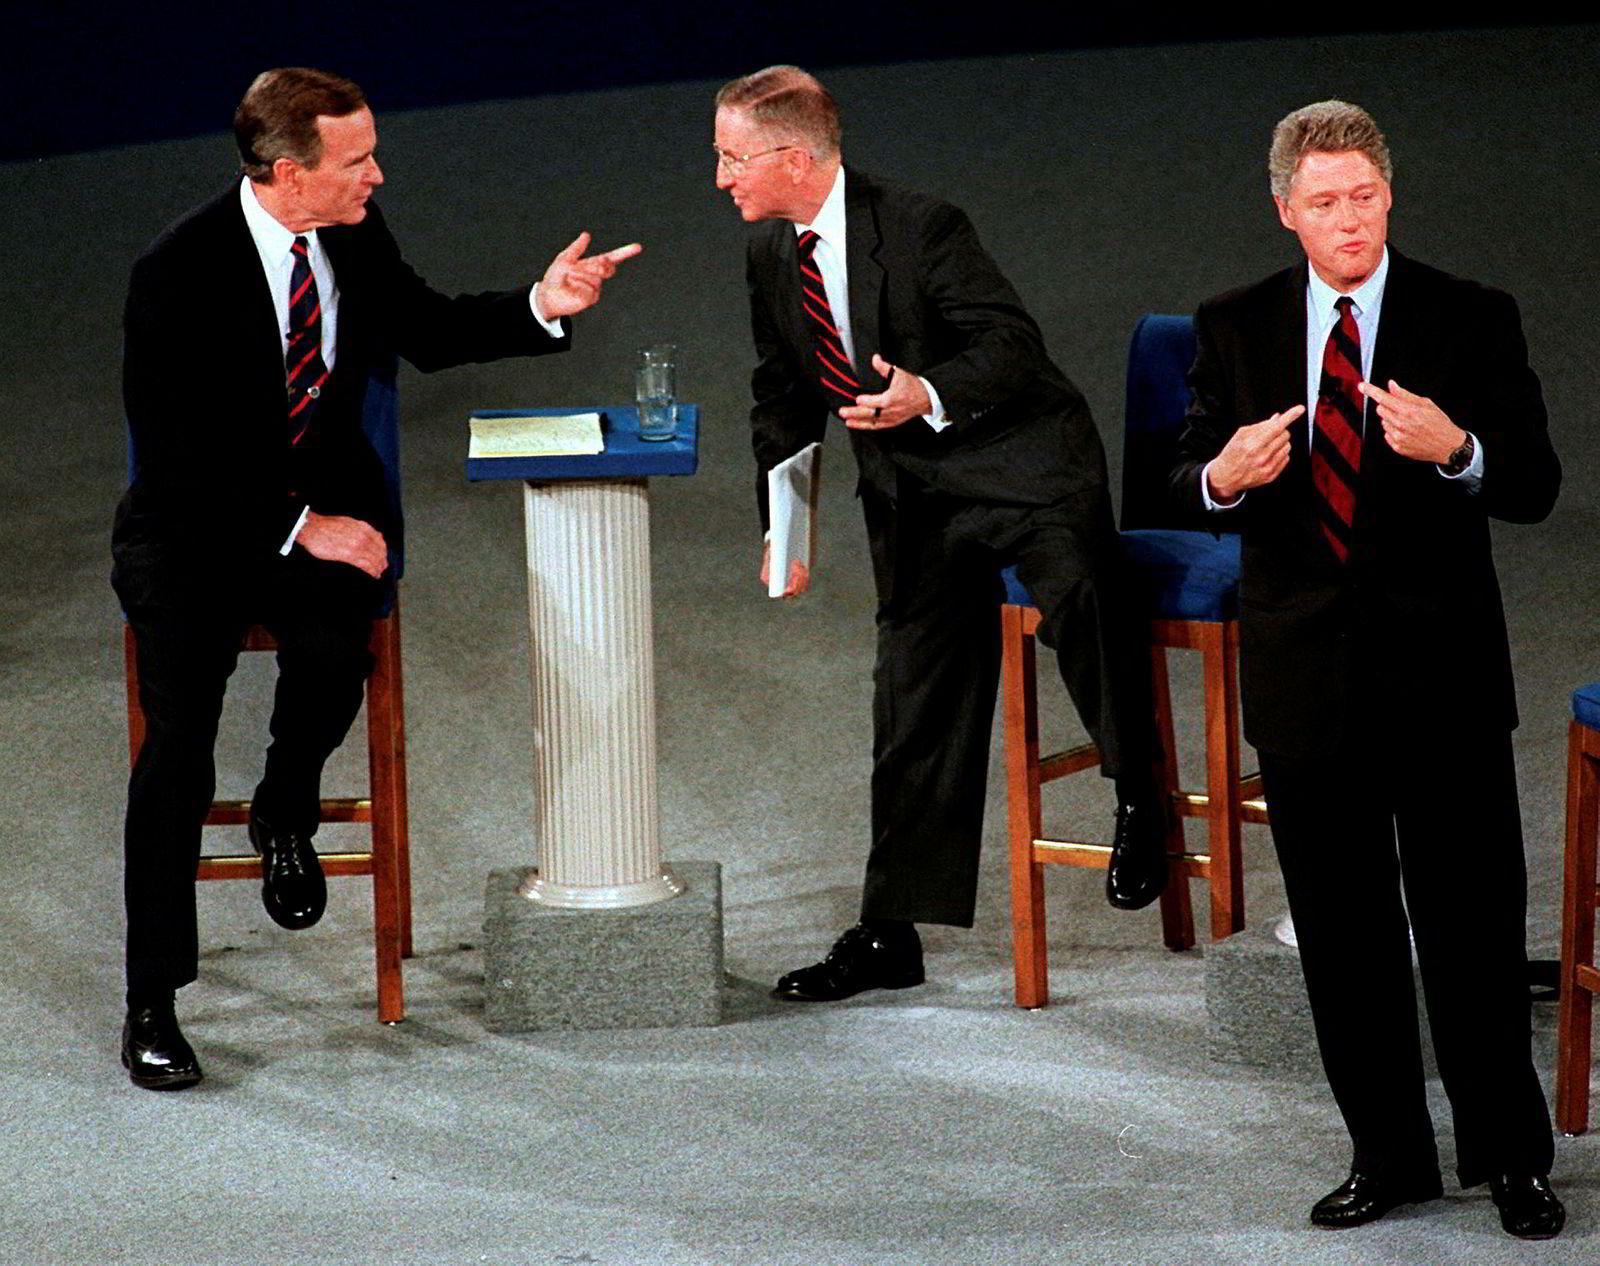 F.v. President George H. W. Bush prater med den uavhengige presidentkandidaten Ross Perot, mens Demokratenes presidentkandidat, Bill Clinton, er henvendt mot publikum i en kandidatdebatt i oktober 1992.